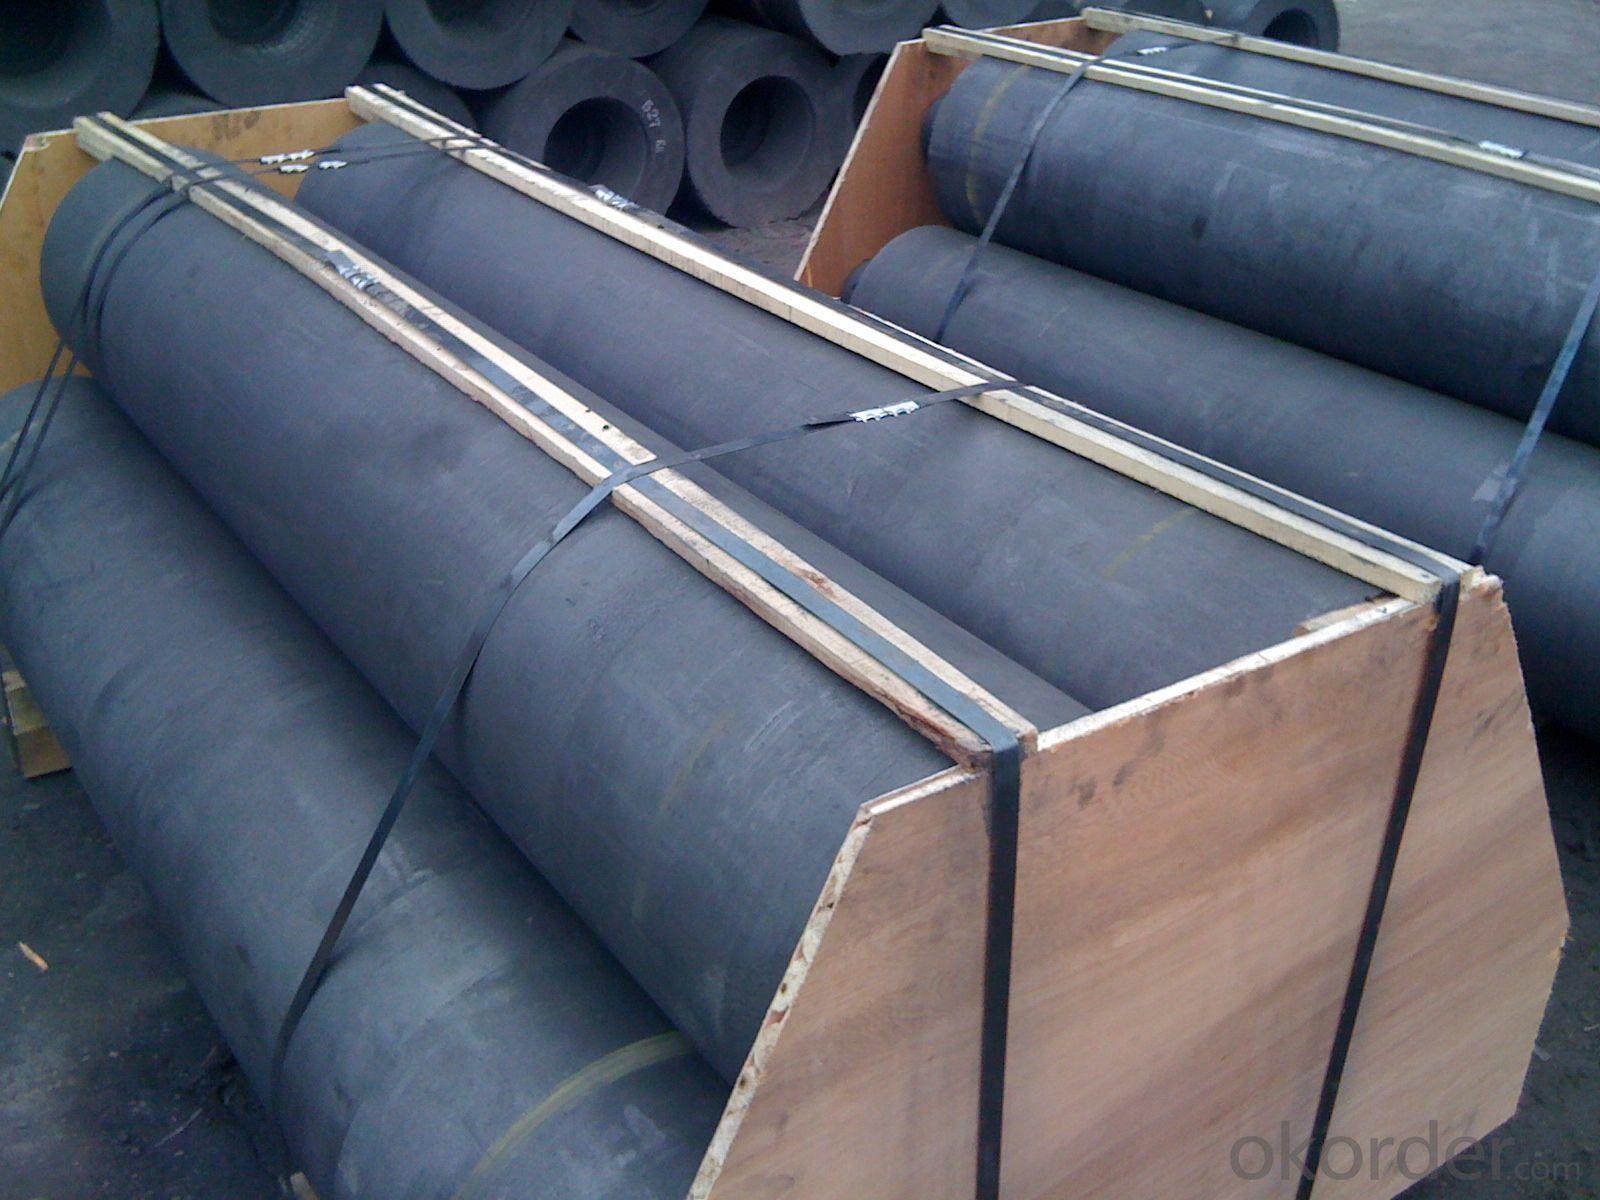 Graphite Electrode Carbon Steel Welding Electrodes